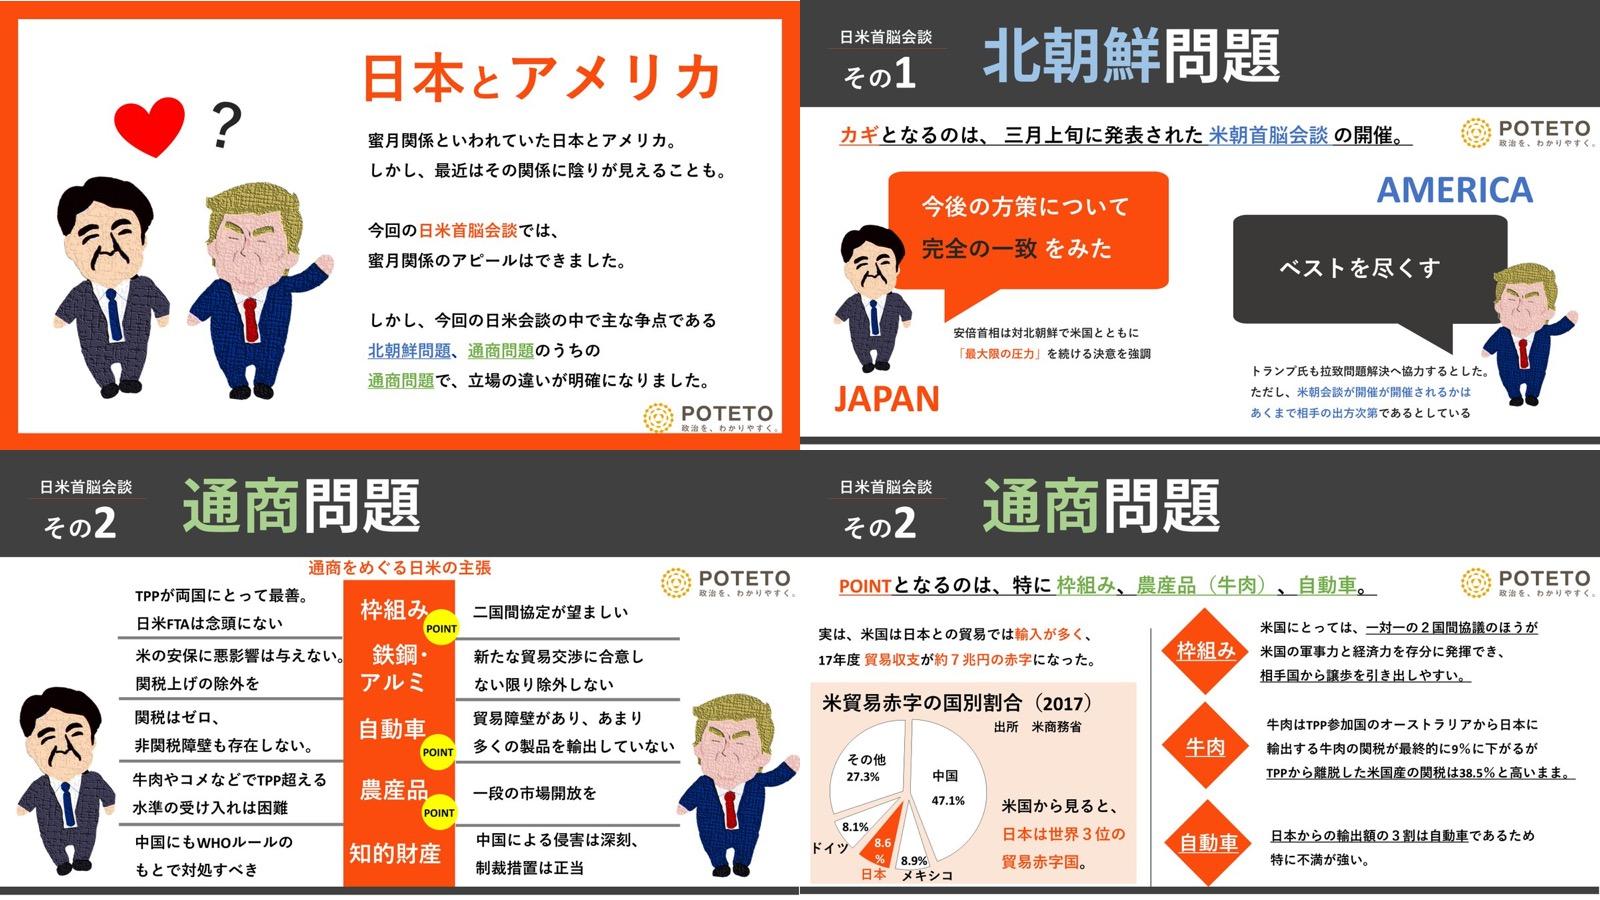 20cfce153c6dcbd30dc35695758066ae - 日米首脳会談の内容をCHECK